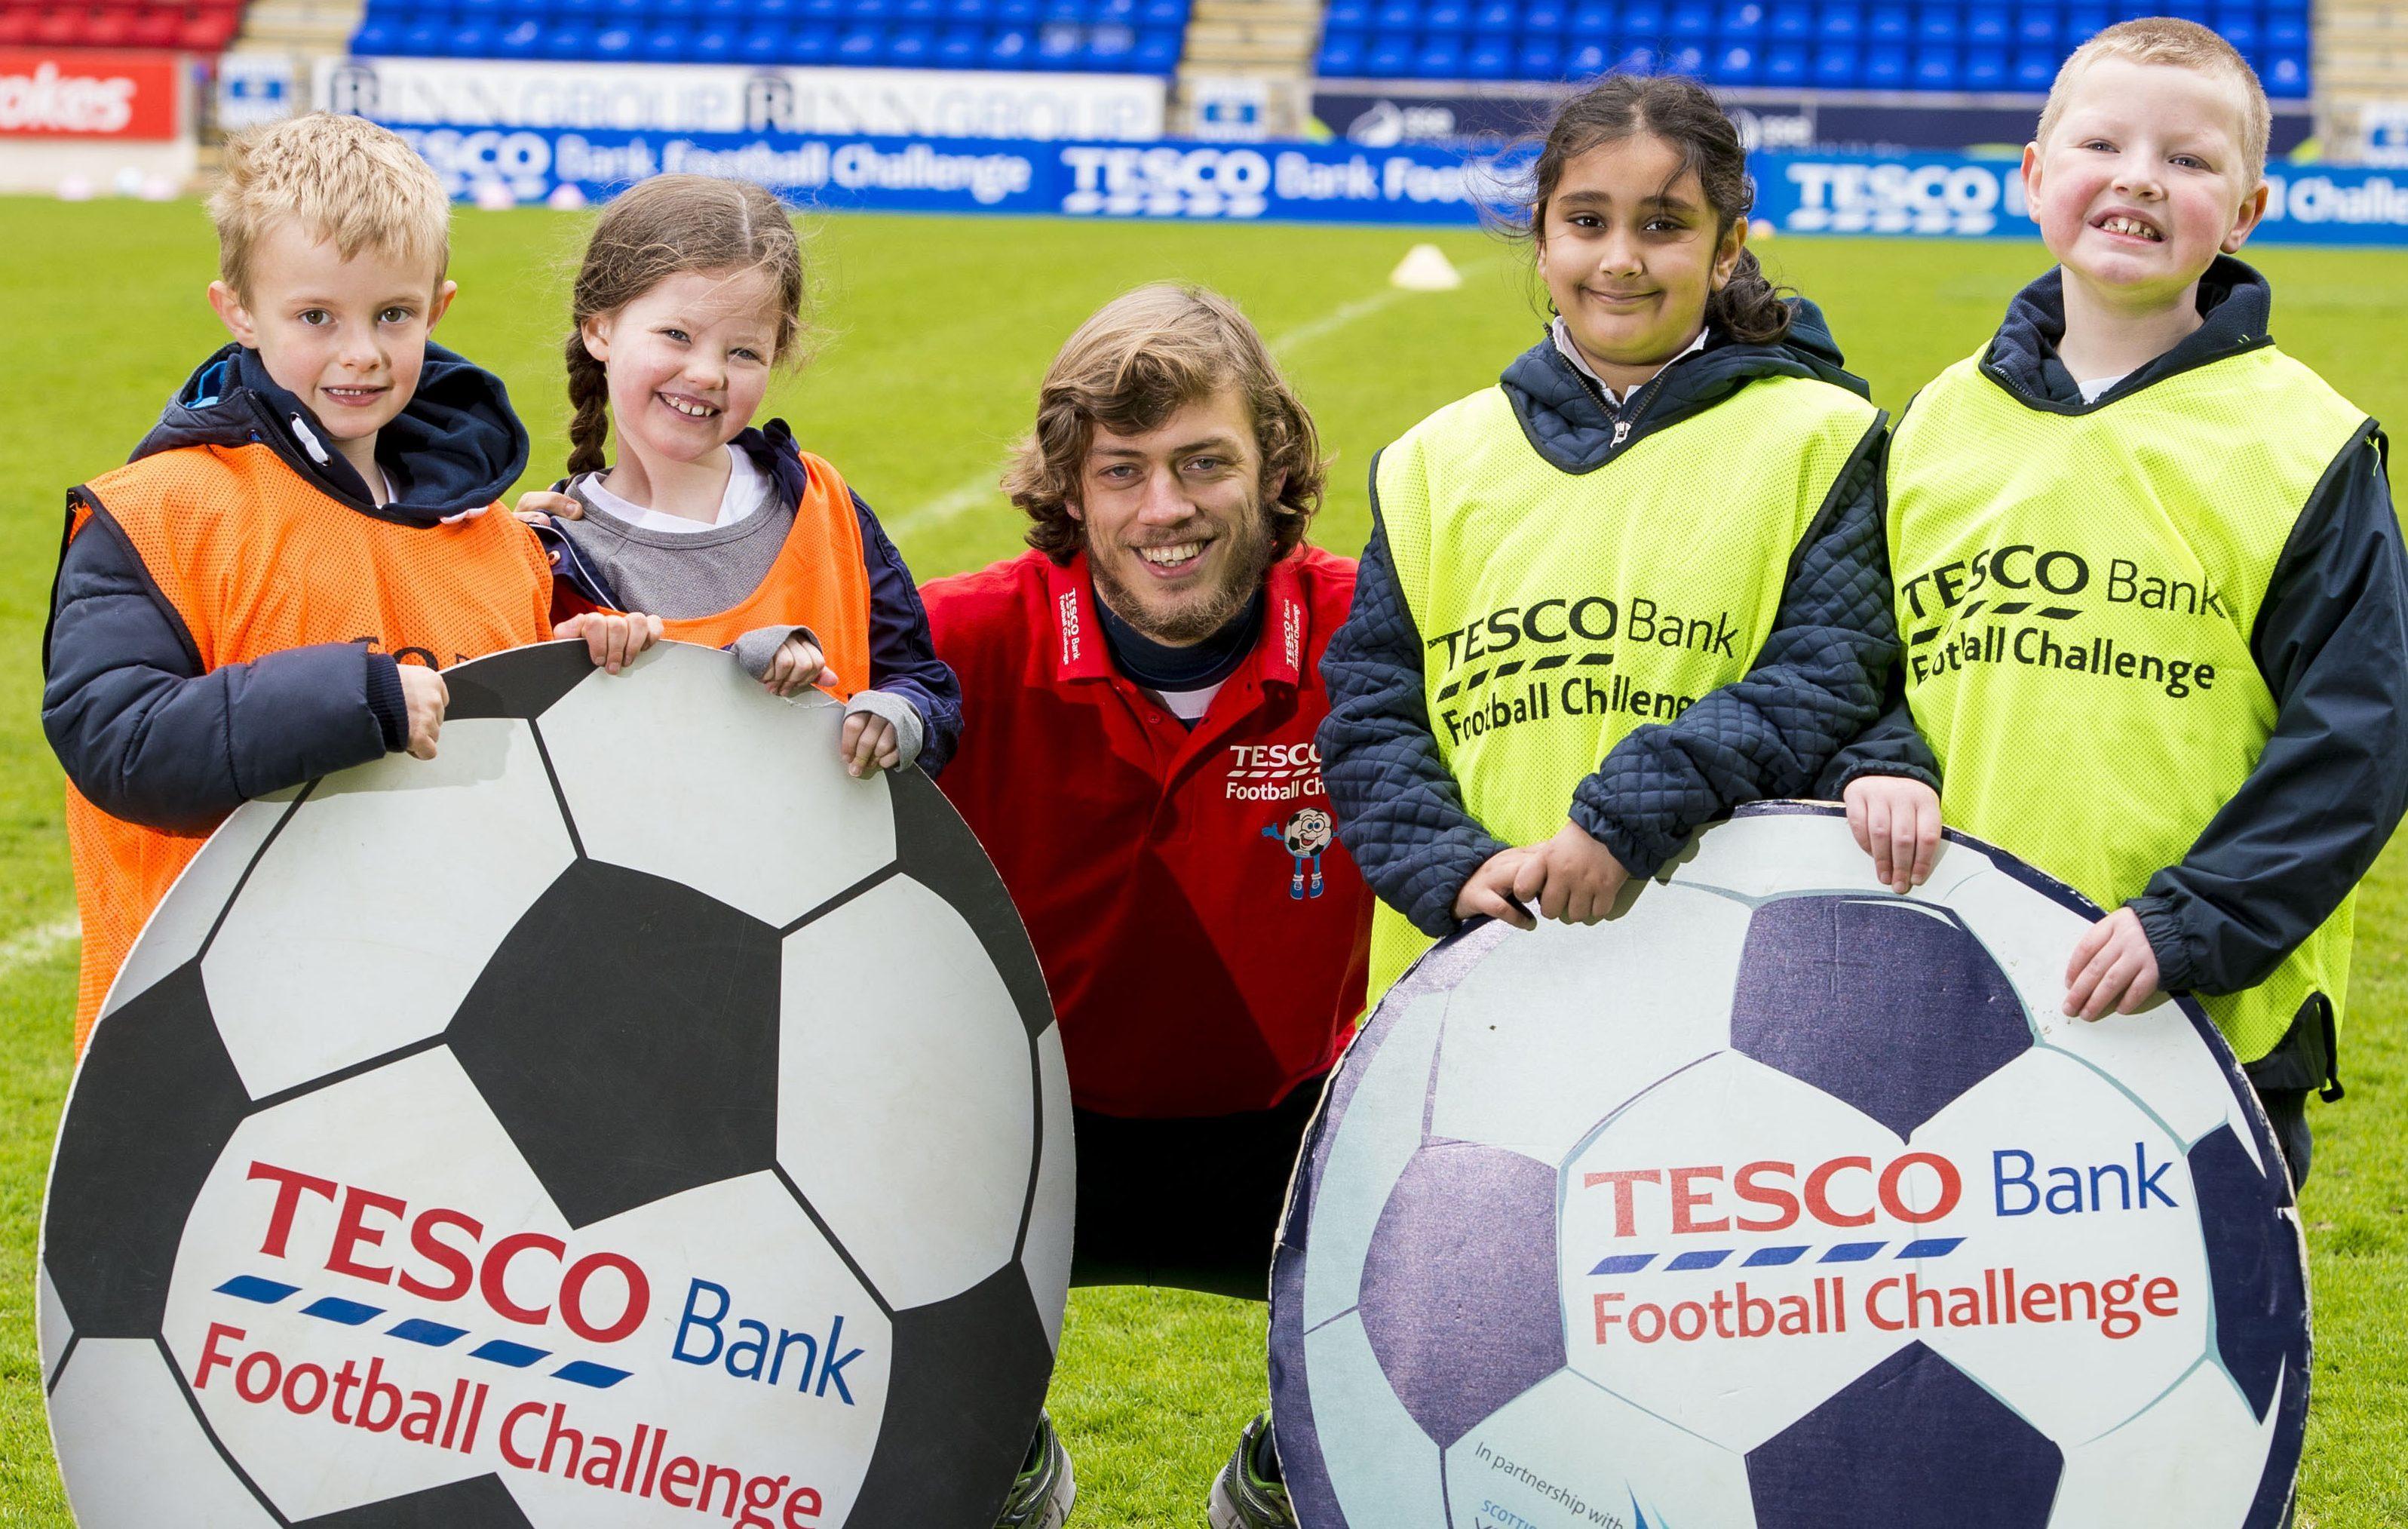 St Johnstone's Murray Davidson (centre) joins Sam Adams, Ava Simmie, Aisha Rifan and Angus Davison to promote the Tesco Bank Football Festival.